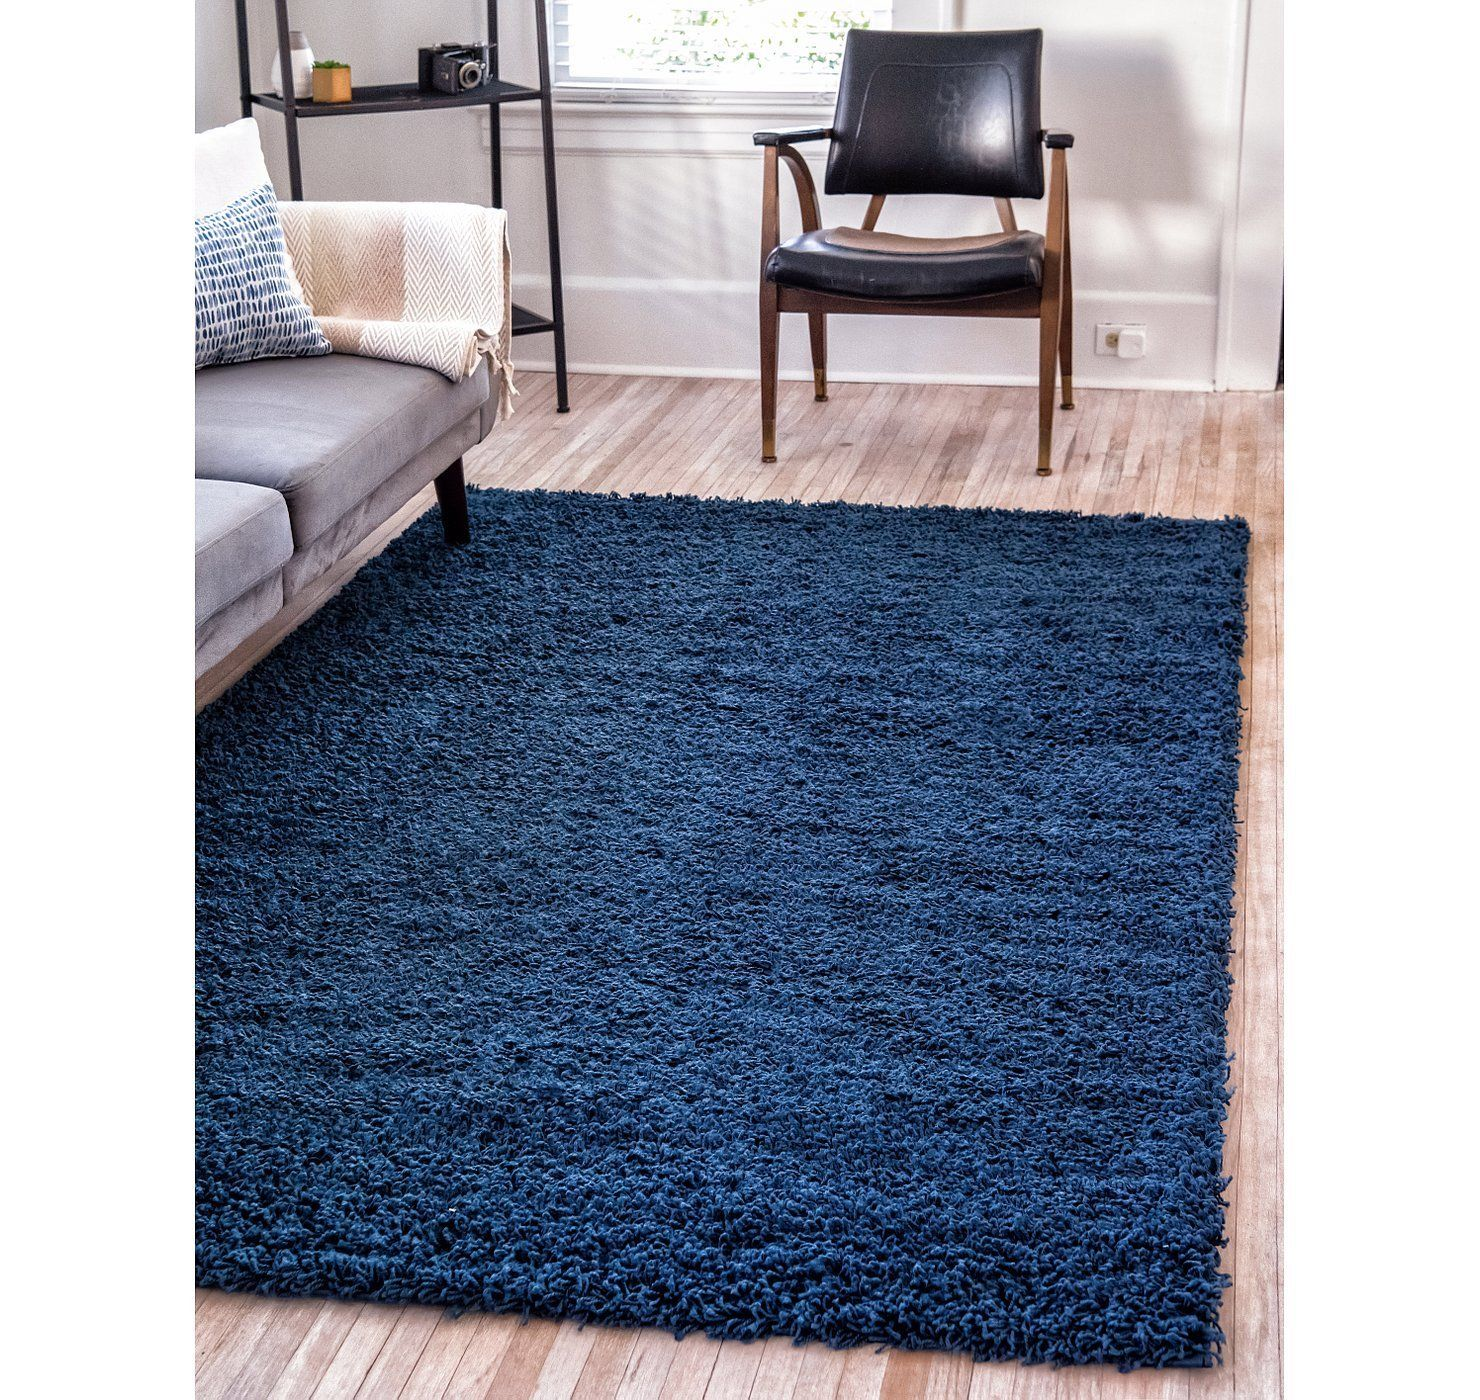 7 X 10 Solid Shag Rug Dark Blue Rug Rugs In Living Room Blue Rug